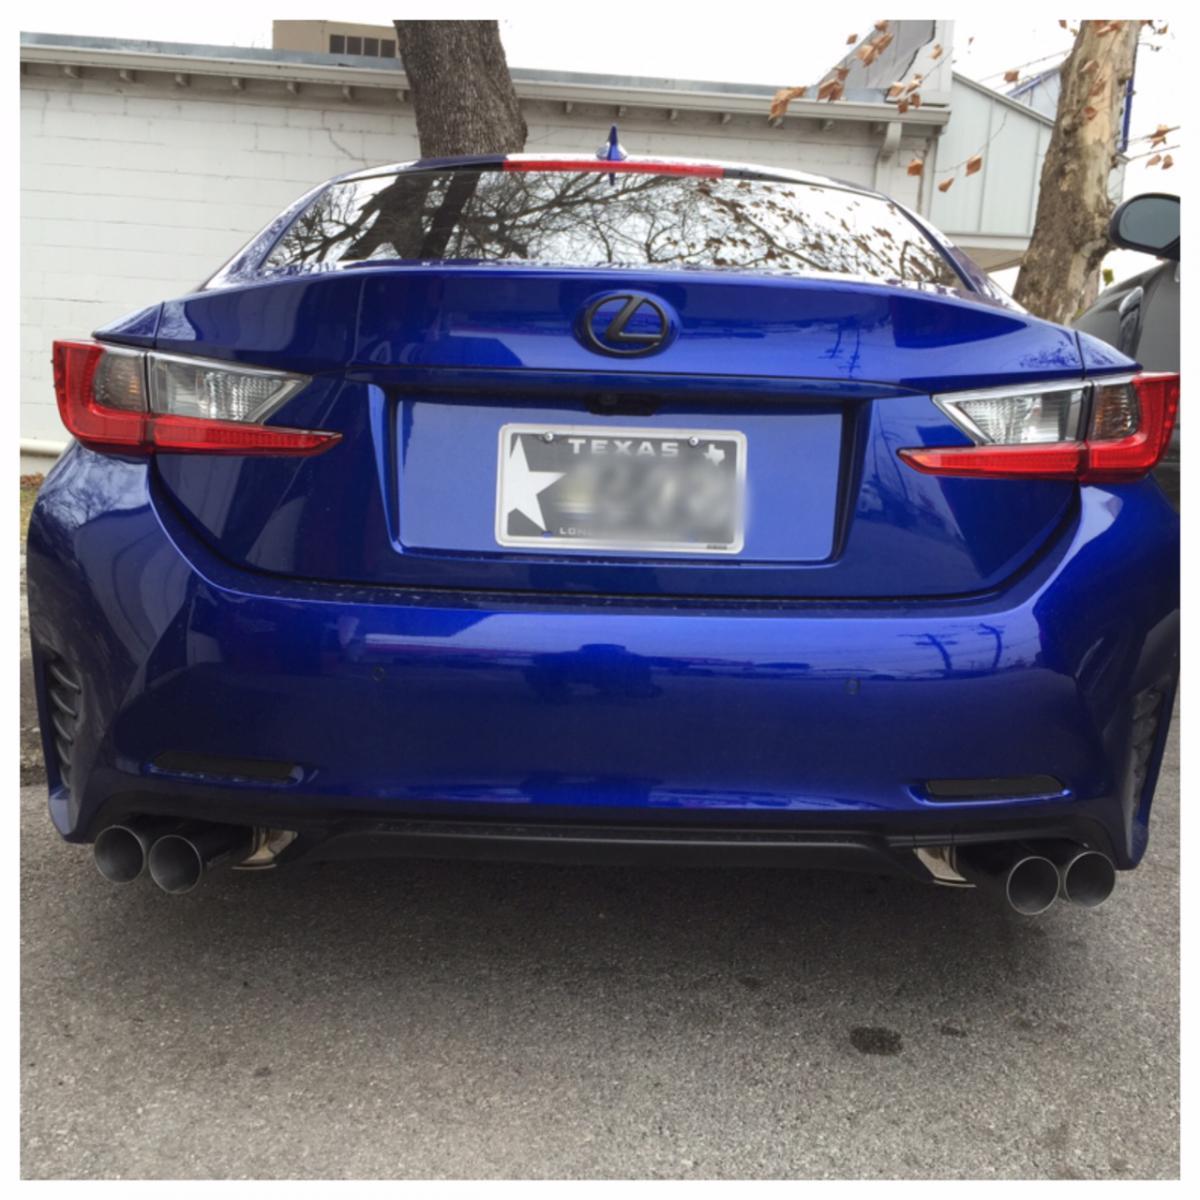 Lexus Rc 350 F Sport Price: My Ultrasonic Blue RC350 F-Sport